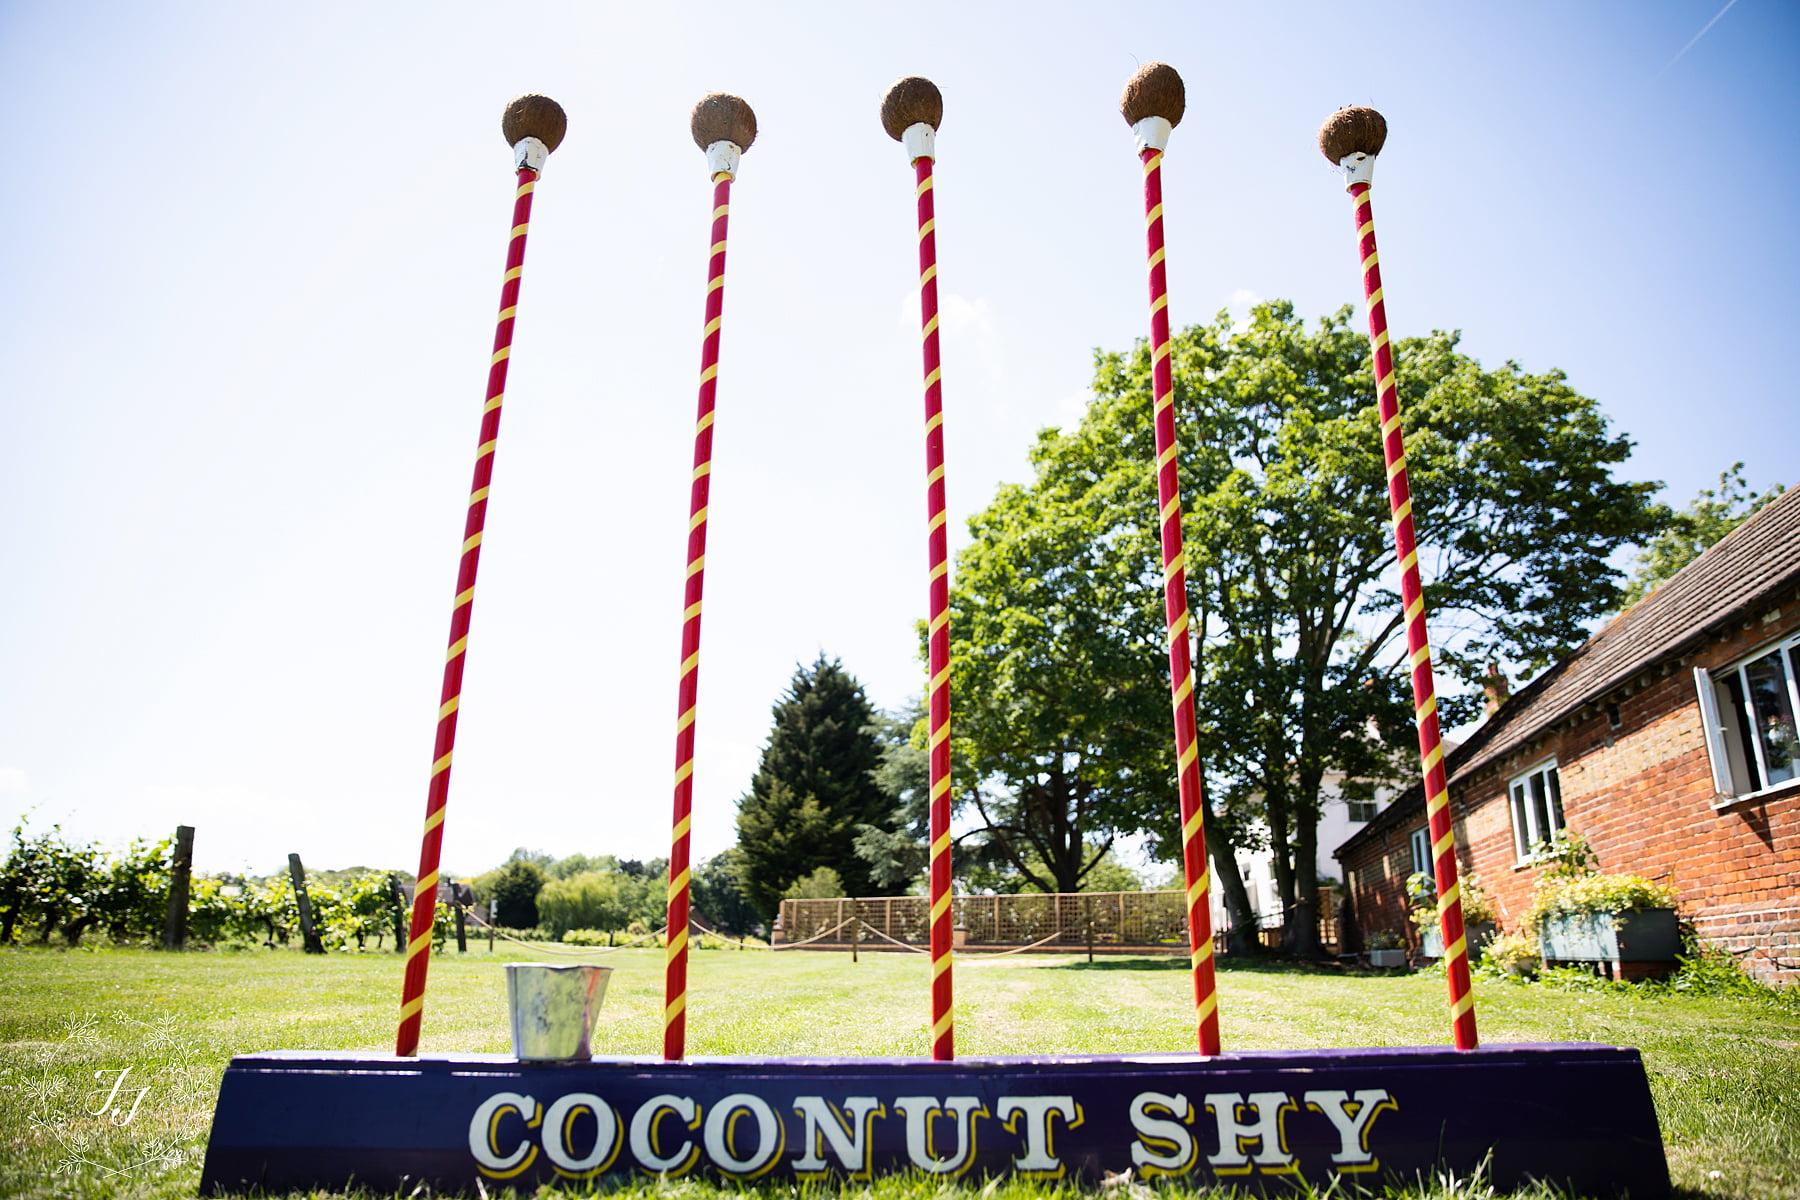 coconut shy at the railway barn Purleigh